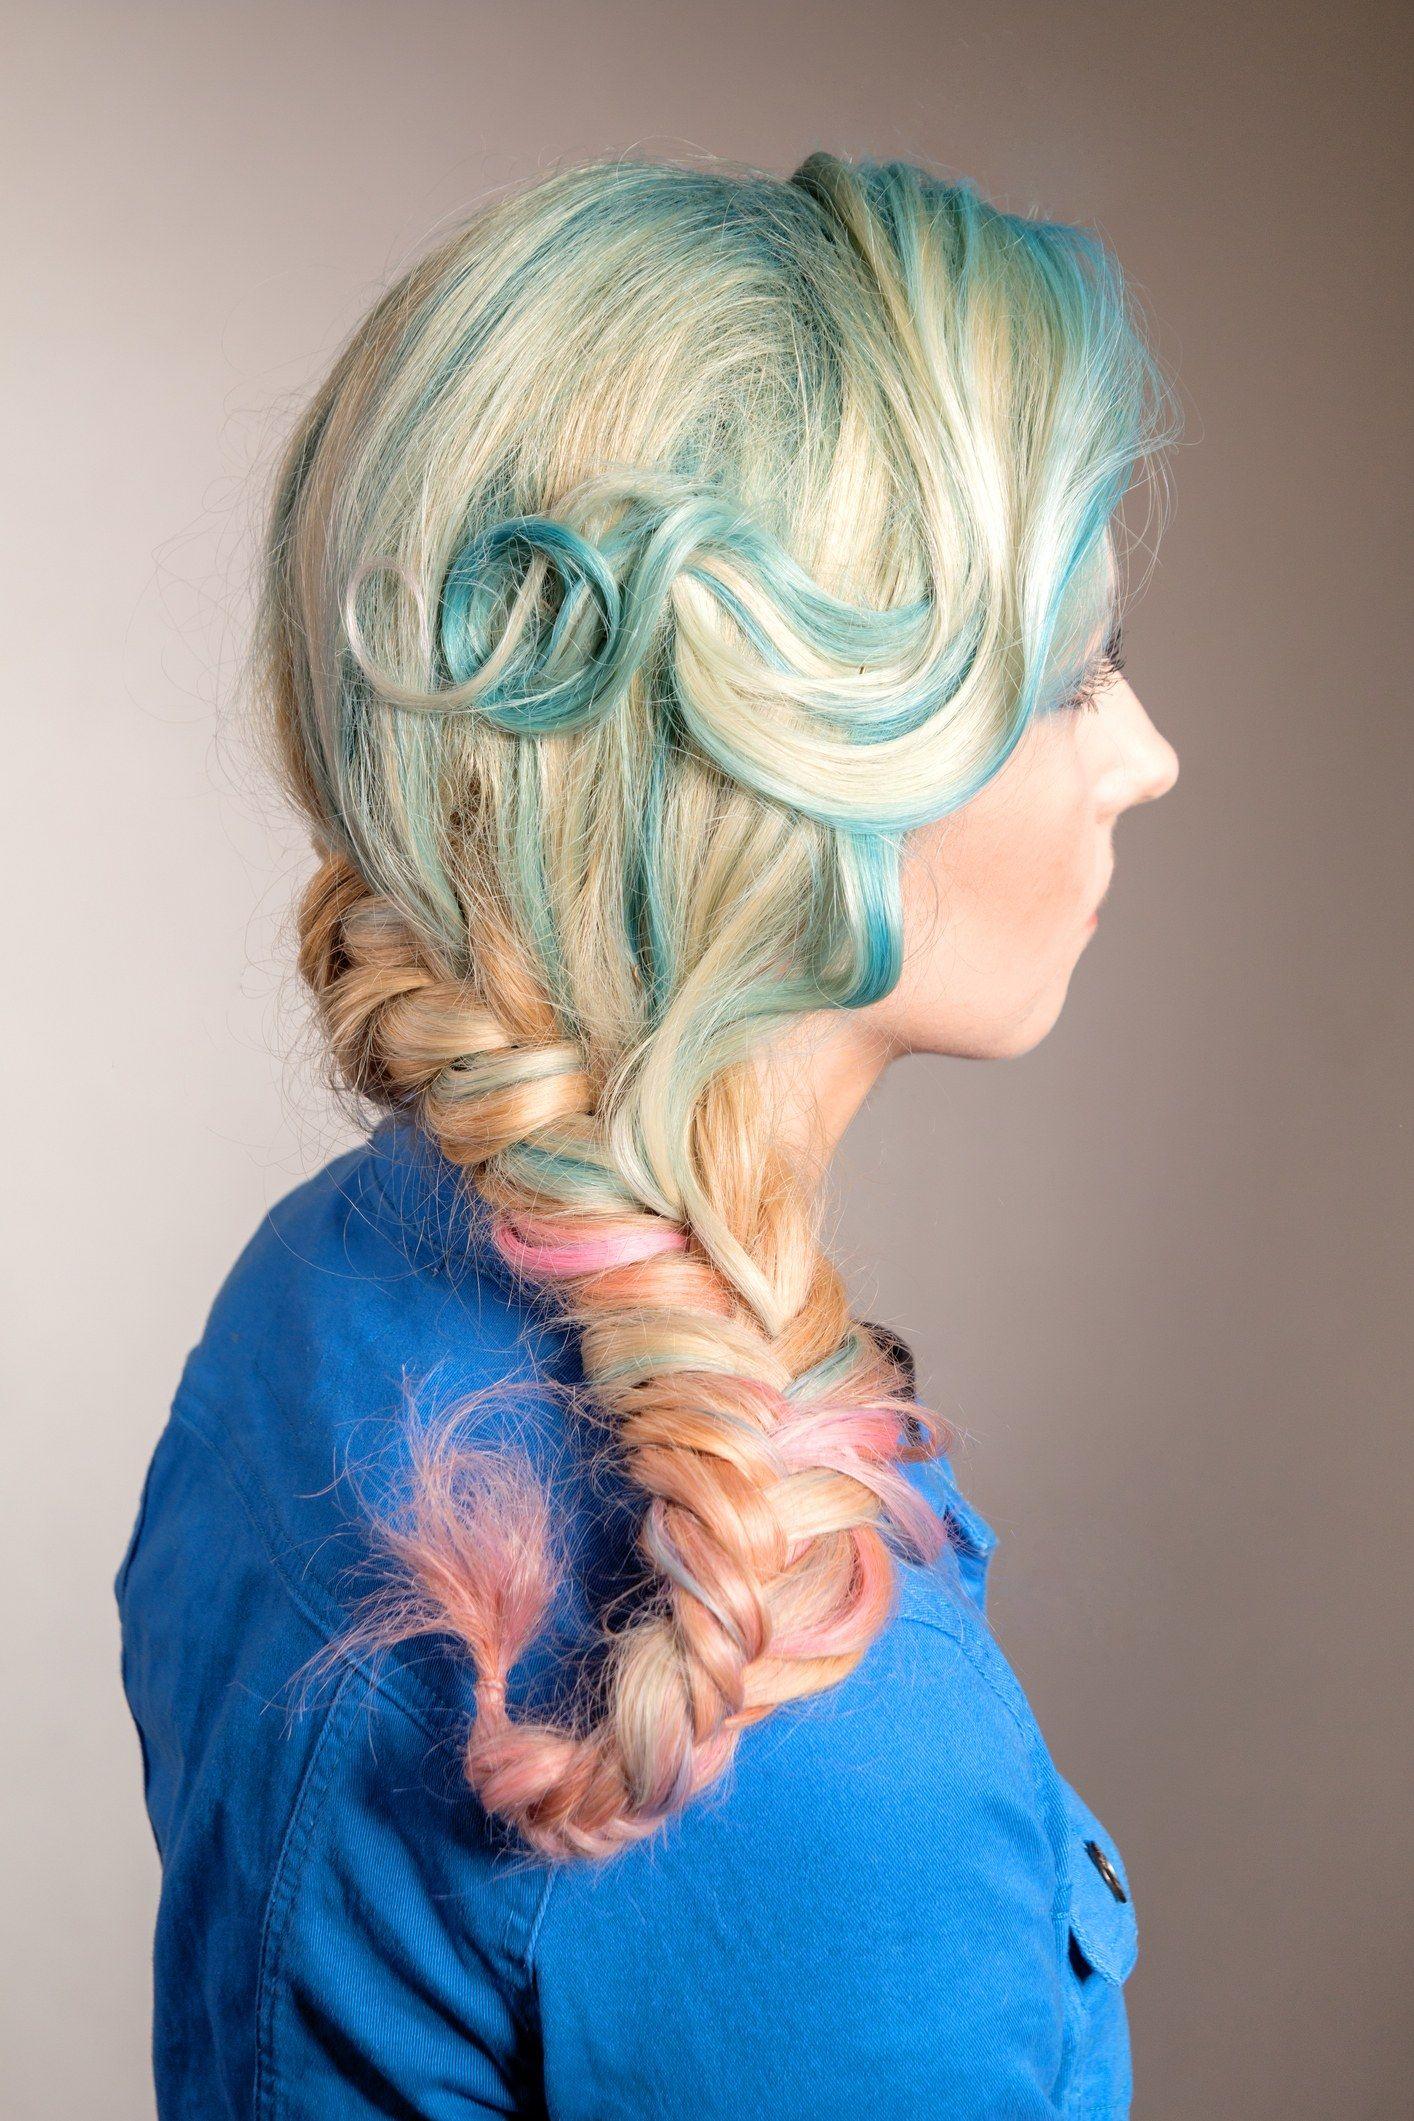 Woman Chemically Burns Her Scalp After Botched Diy Unicorn Dye Job Dyed Hair Hair Beauty Unicorn Hair